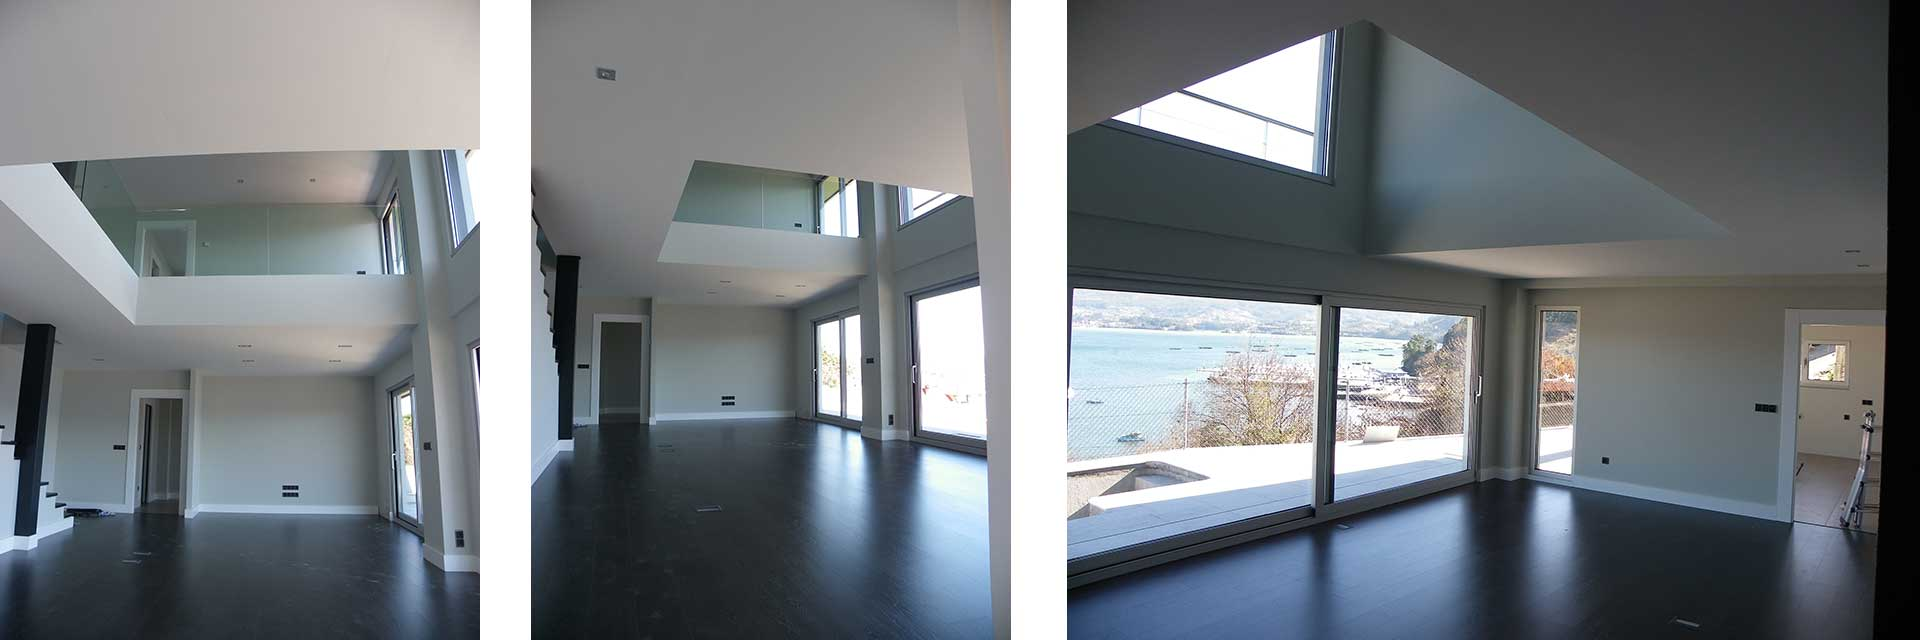 viviendas-doble-altura